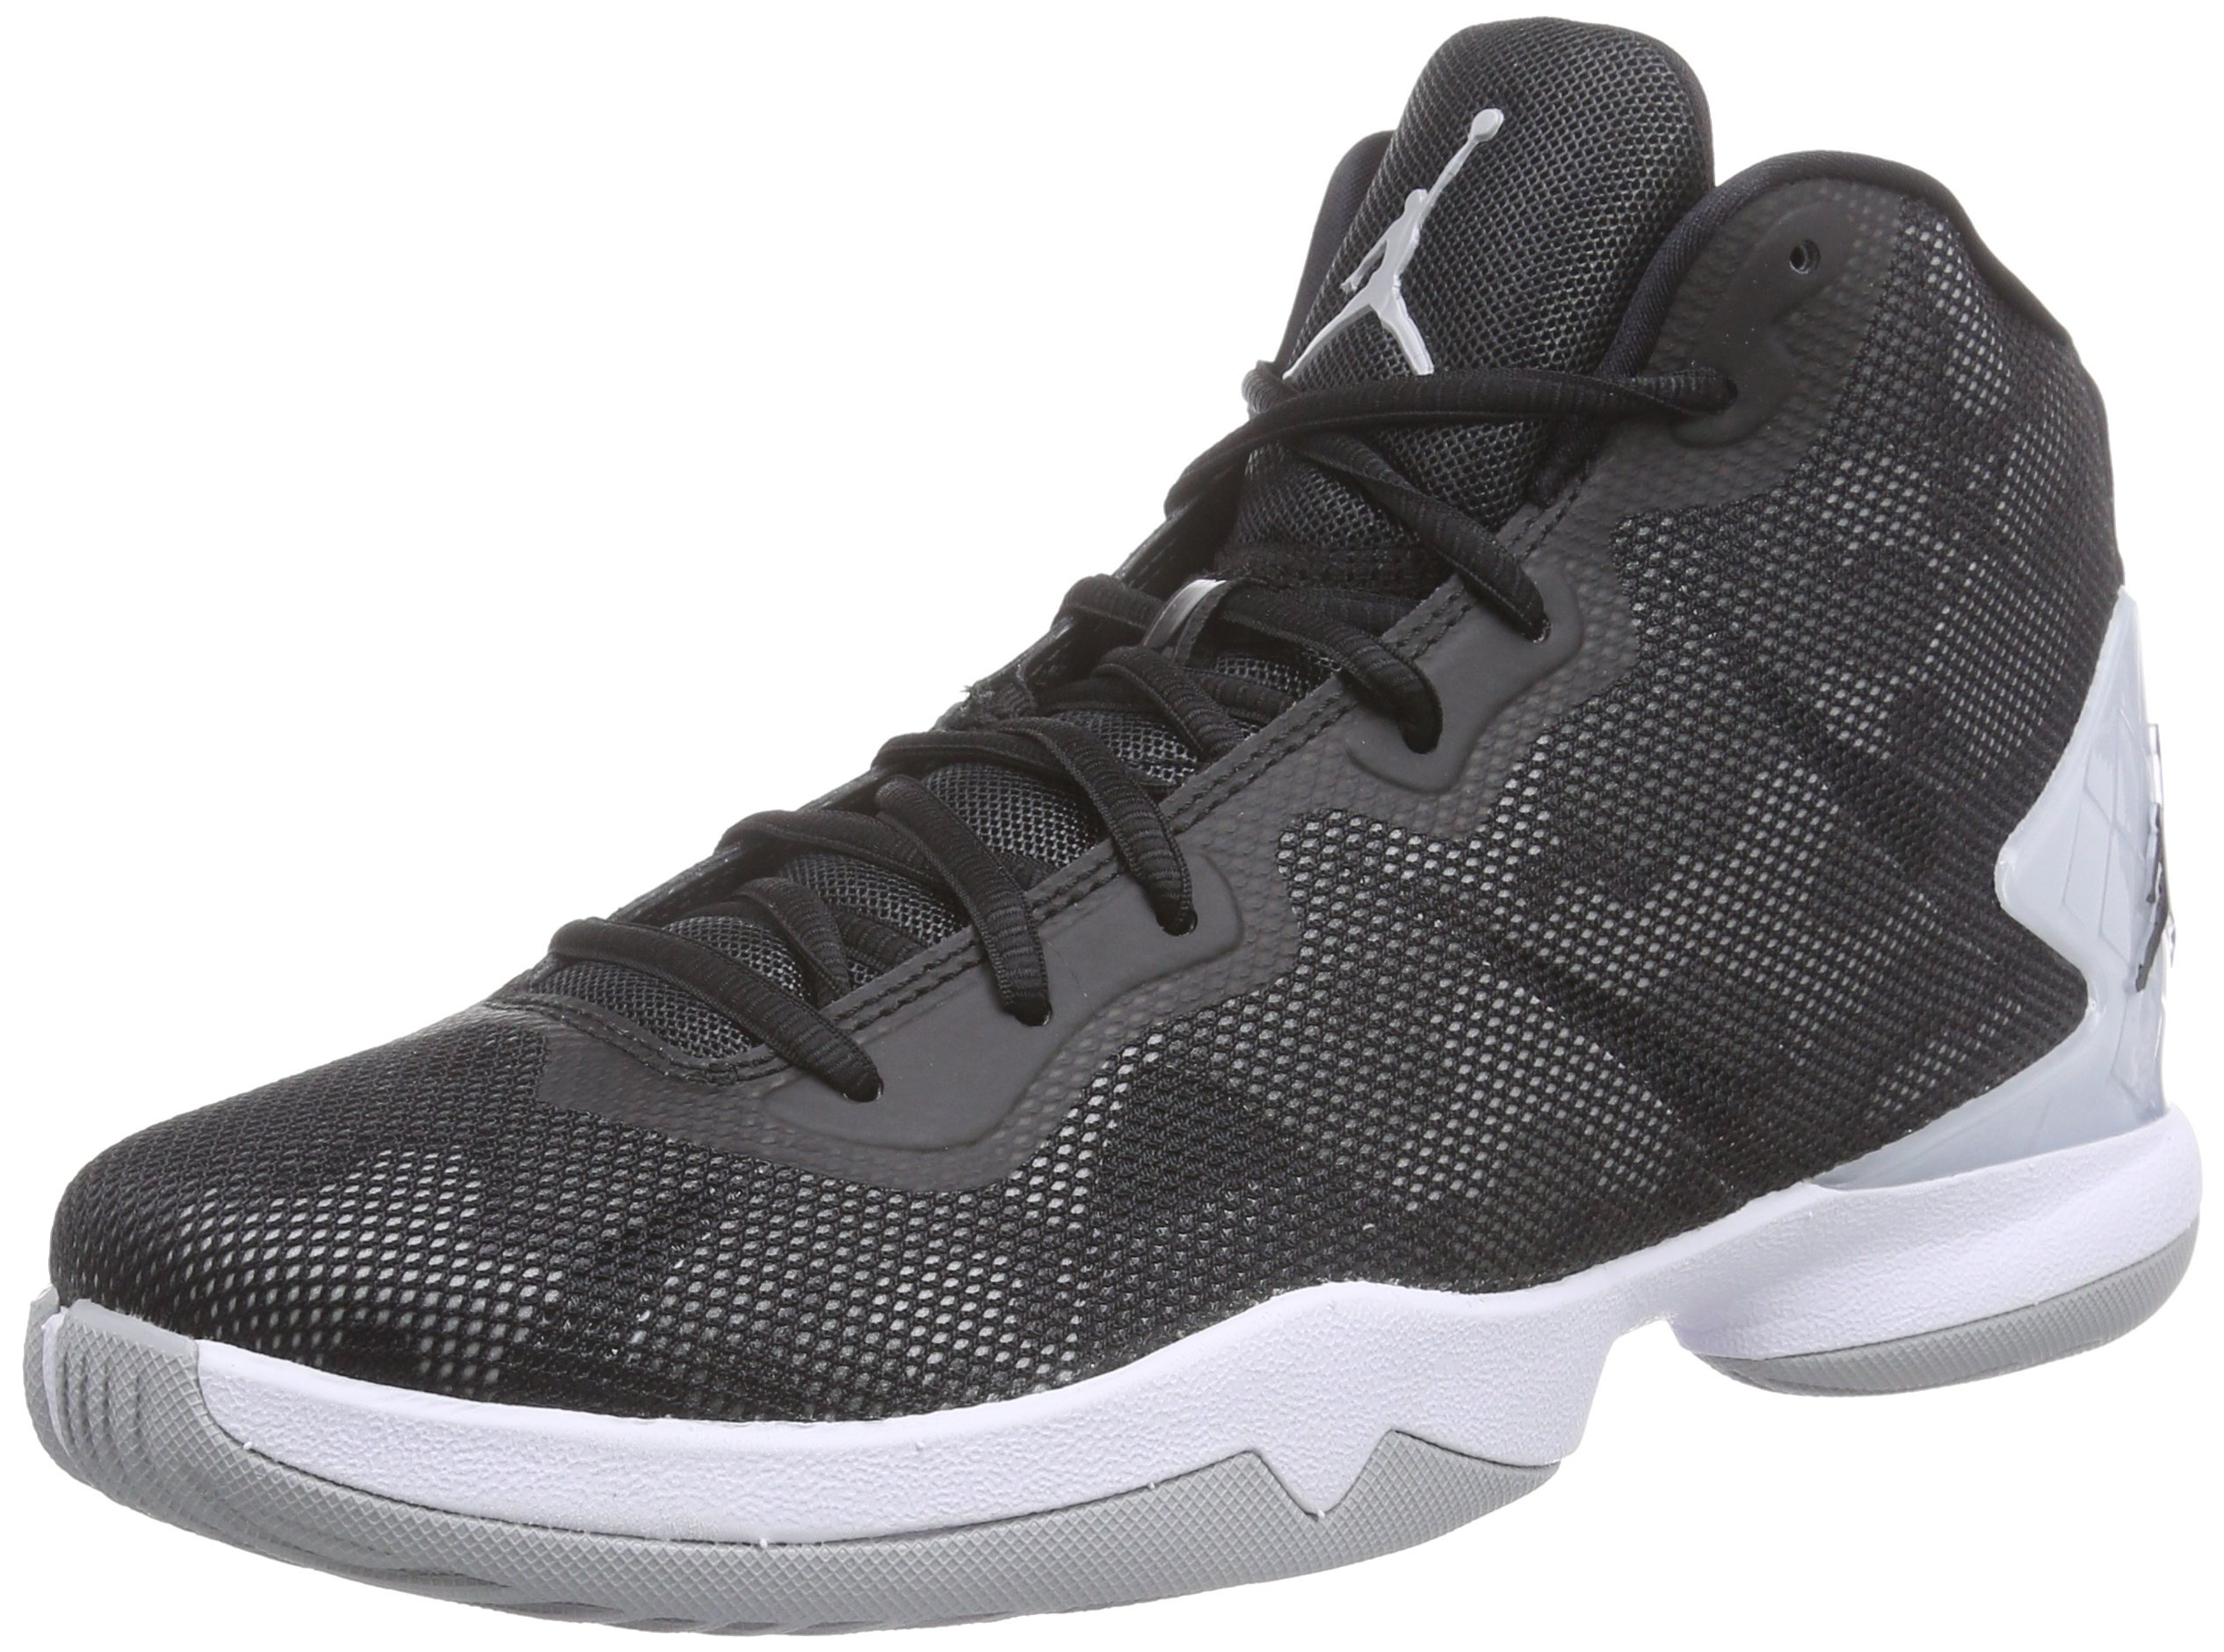 Jordan Super.Fly 4 Black/Wolf Grey-Infrared 23 768929-007